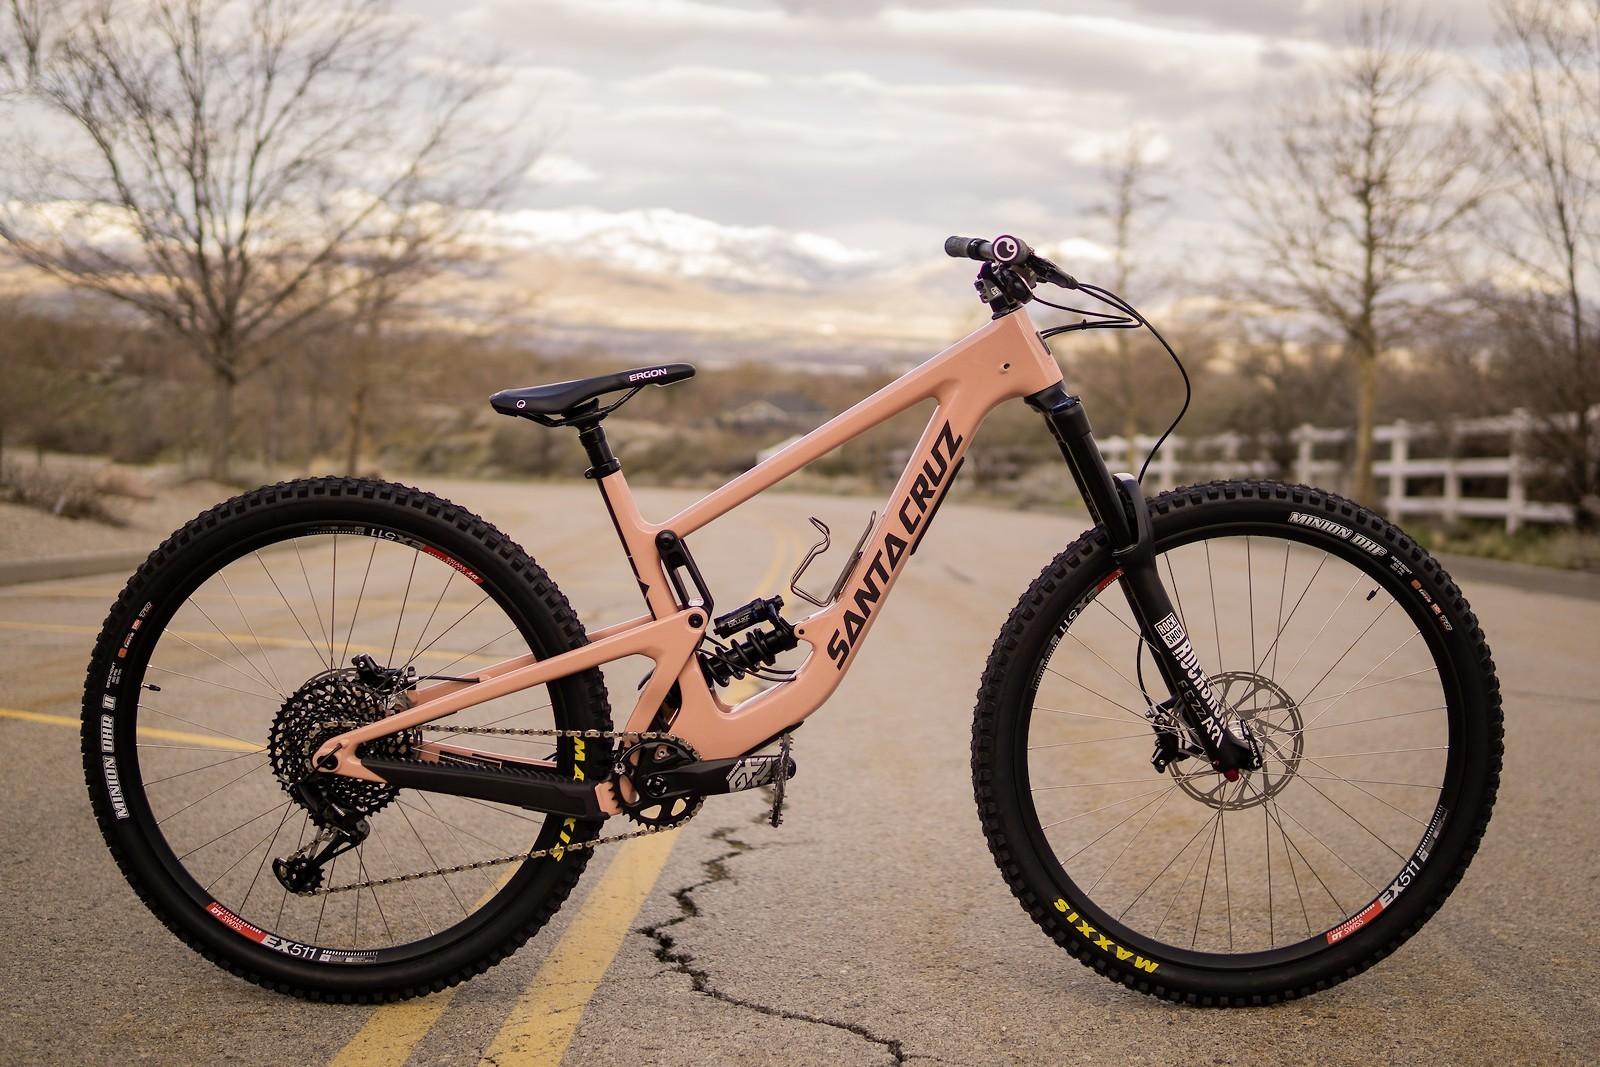 Santa Cruz Megatower - 2019 Vital Bike of the Day Collection - Mountain Biking Pictures - Vital MTB